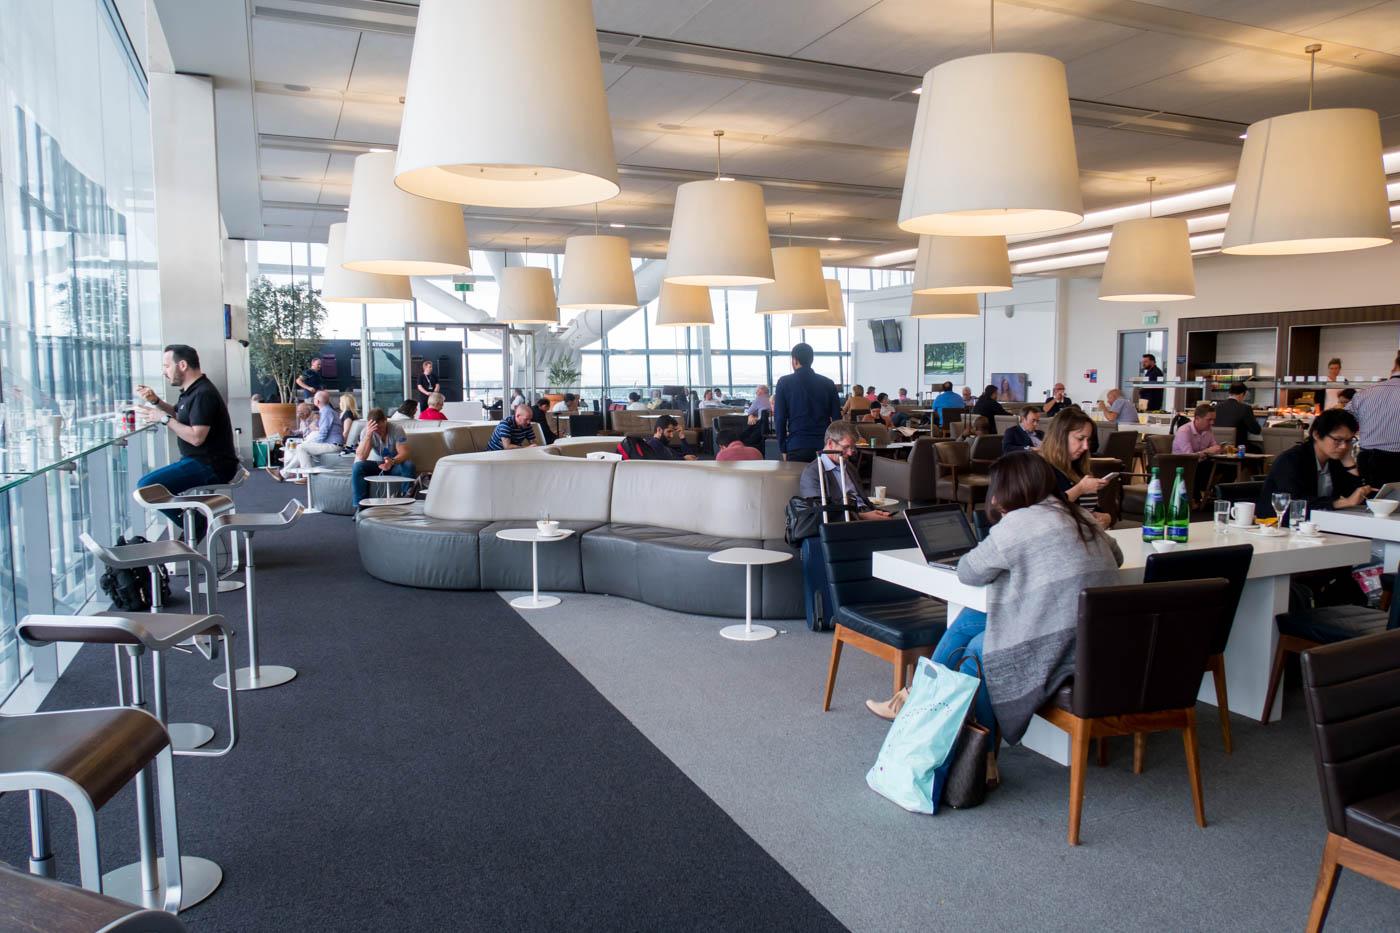 British Airways Galleries Lounge North Dining Area